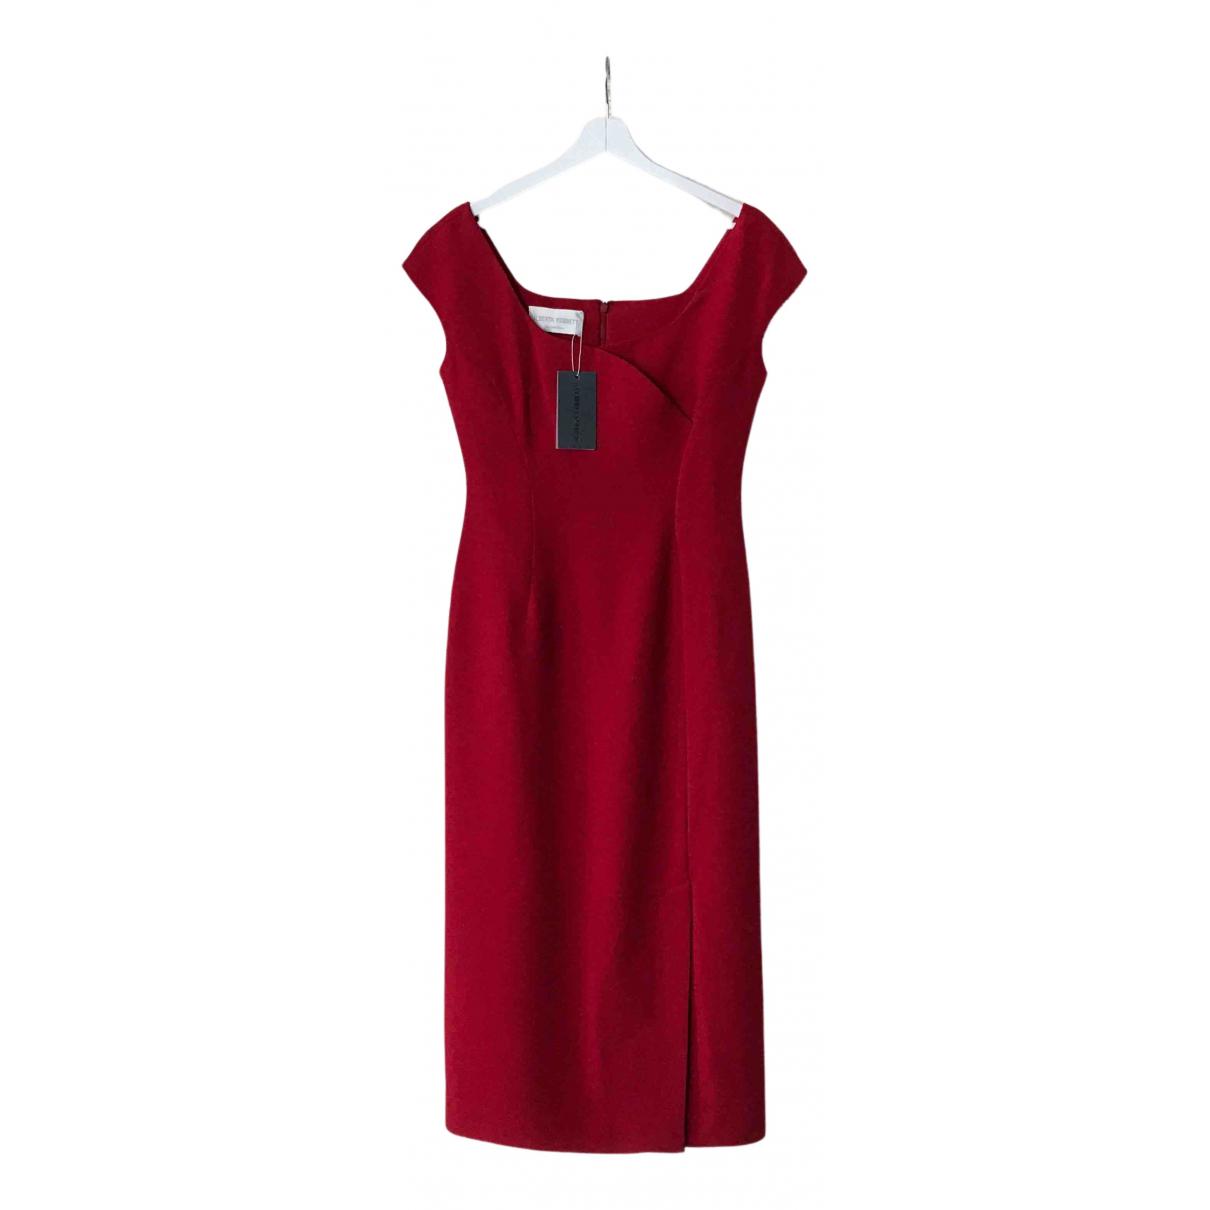 Alberta Ferretti \N Kleid in  Rot Viskose